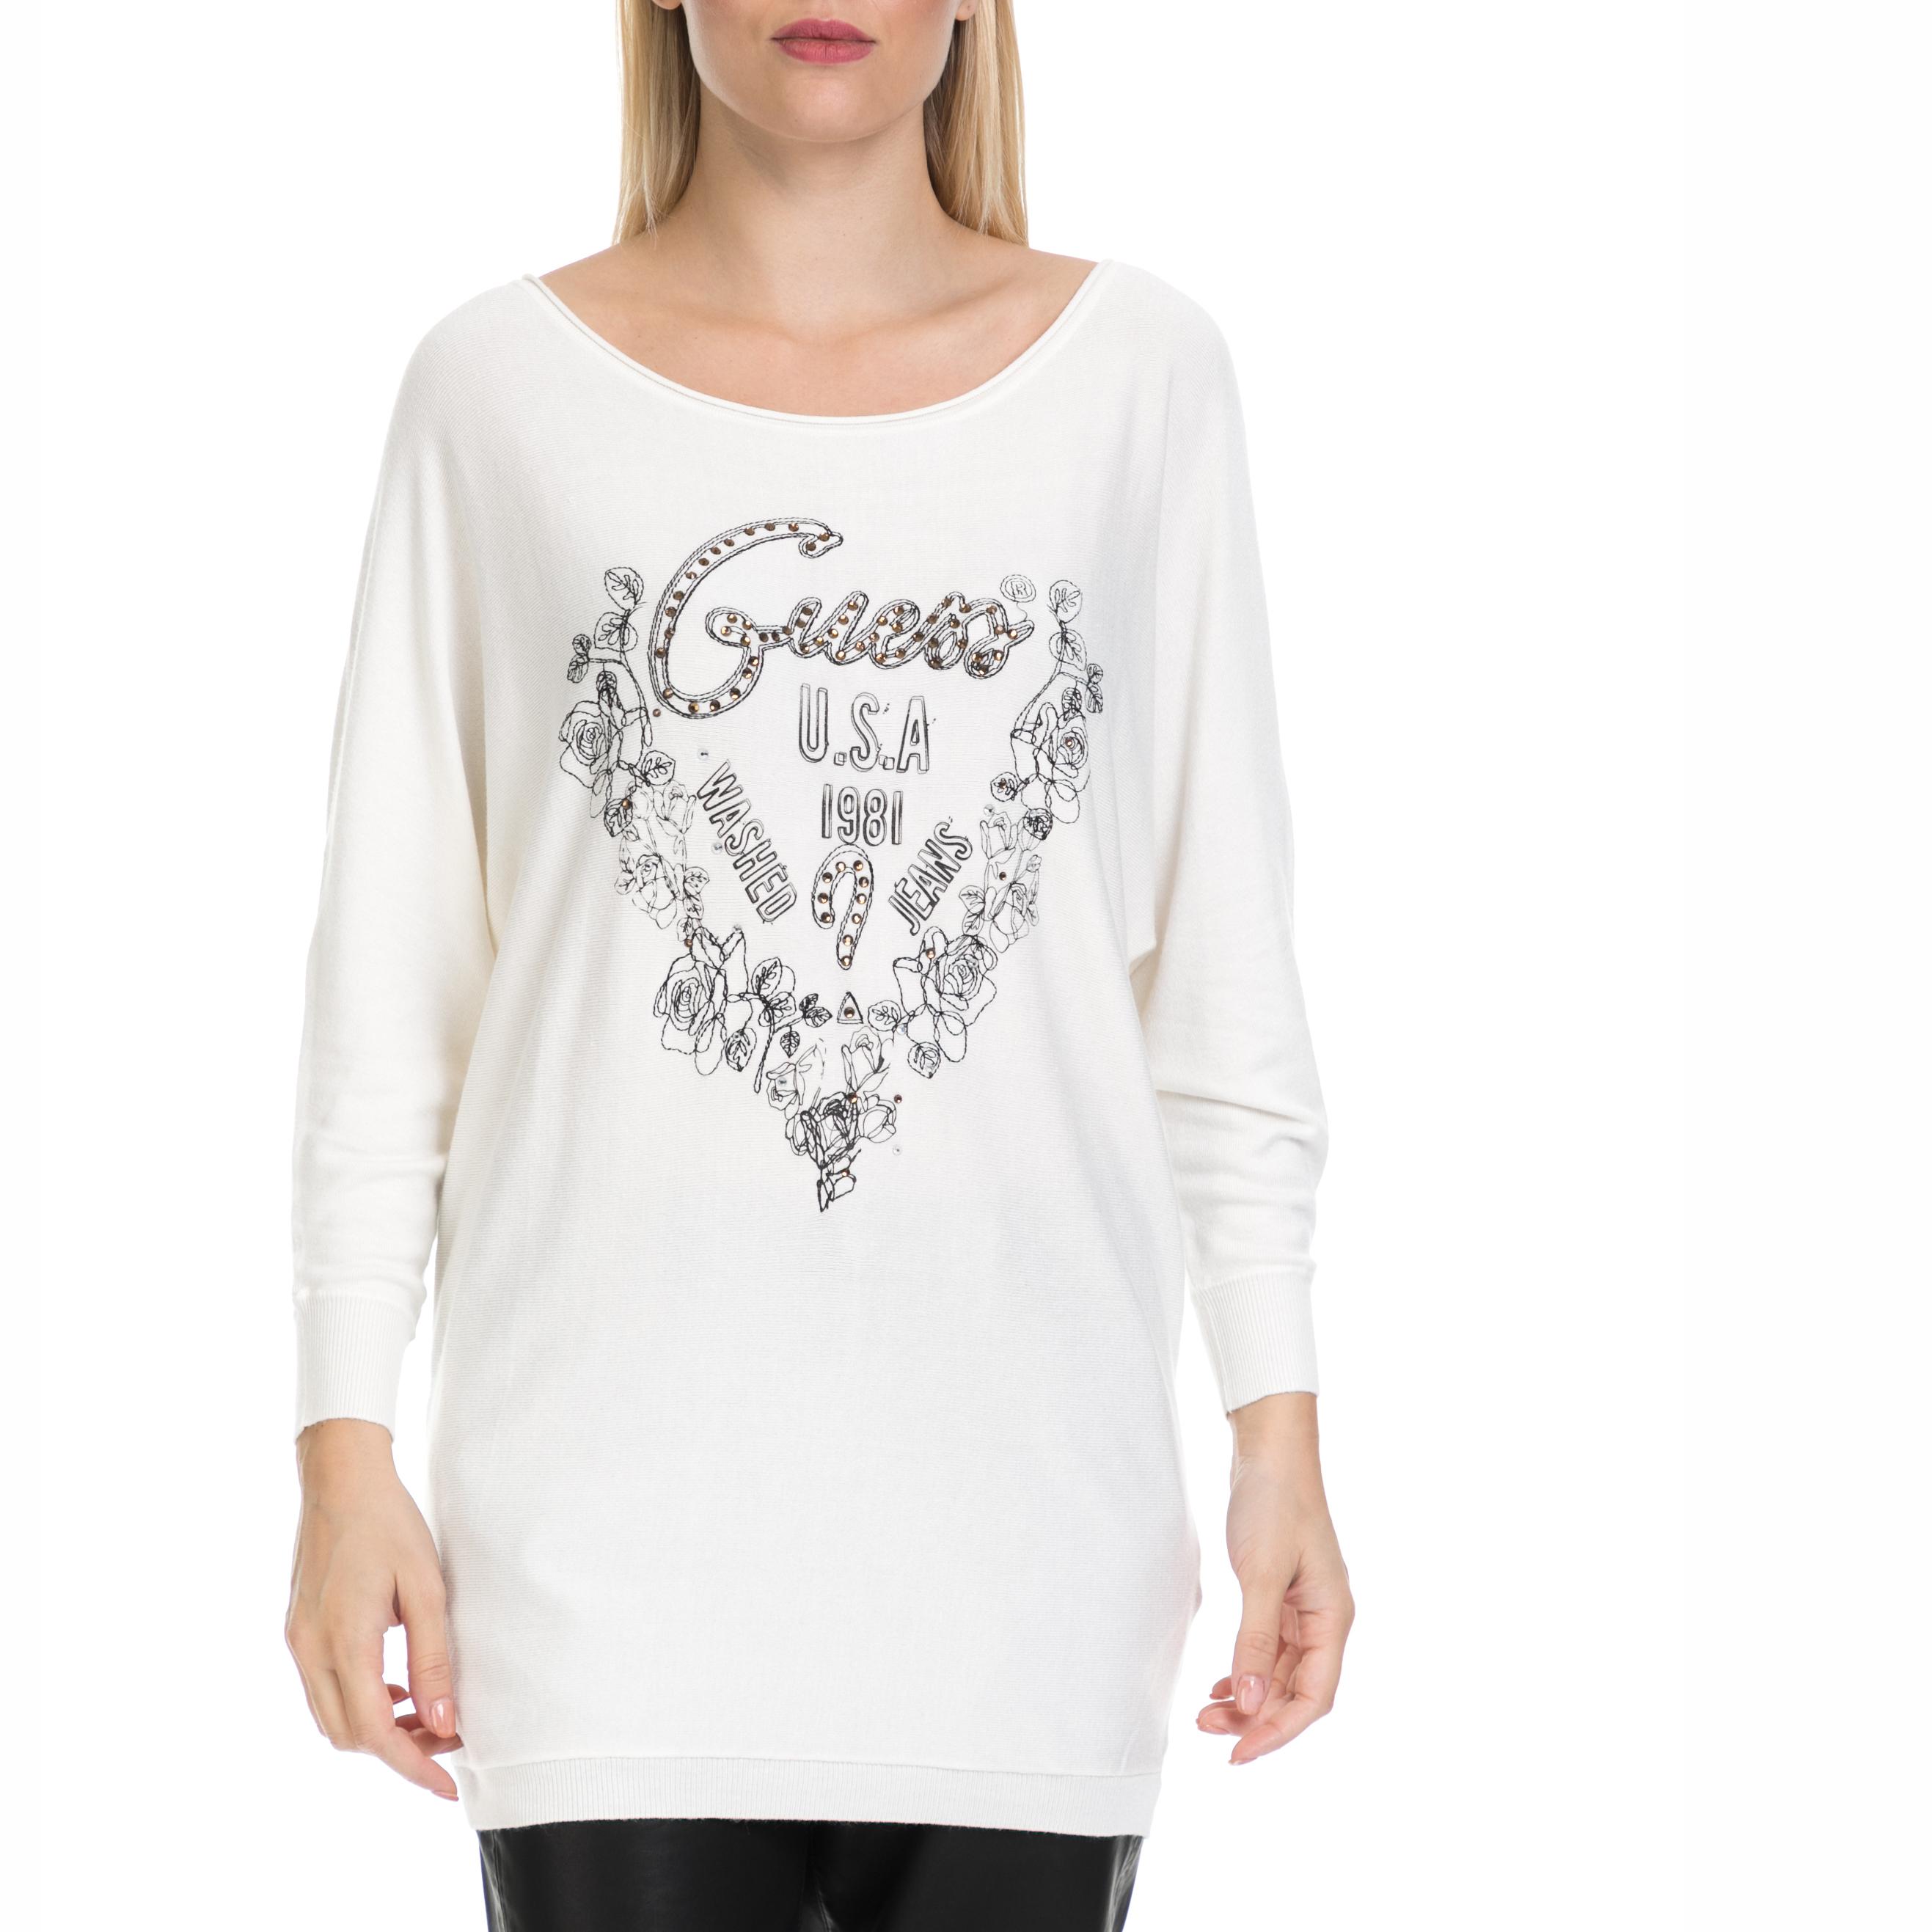 a57f82c97007 GUESS - Γυναικεία μπλούζα LEA GUESS λευκή